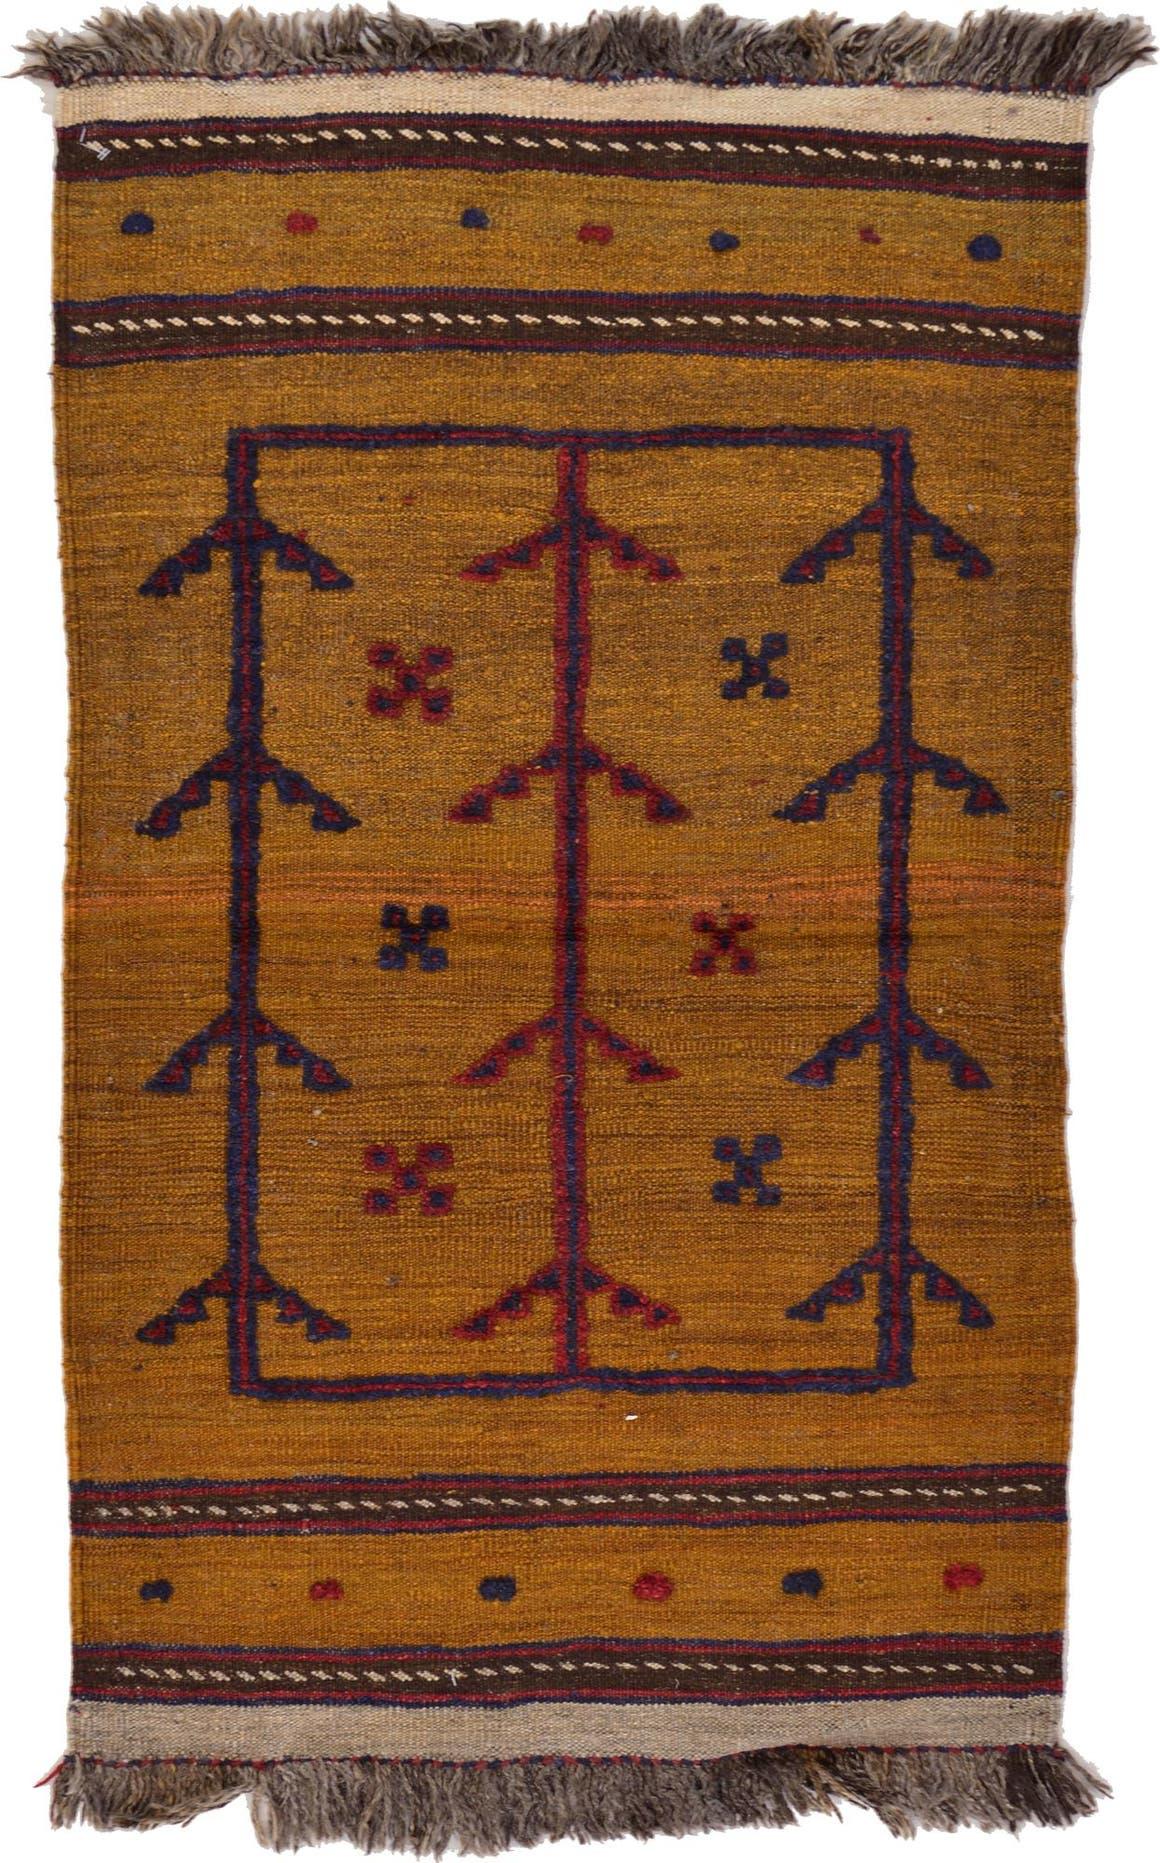 2' 4 x 3' 11 Kilim Afghan Rug main image